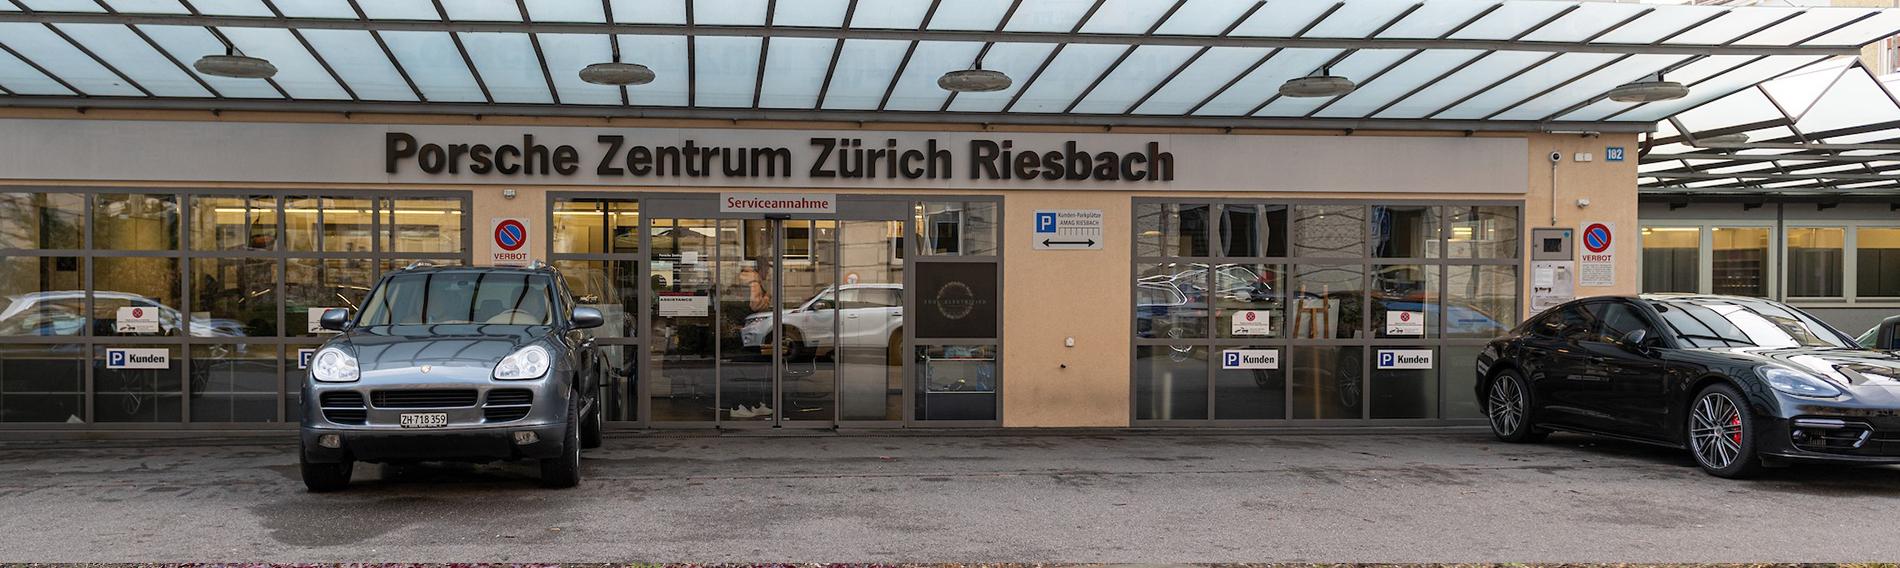 Cleaning at the Porsche Centre in Zurich (CH)